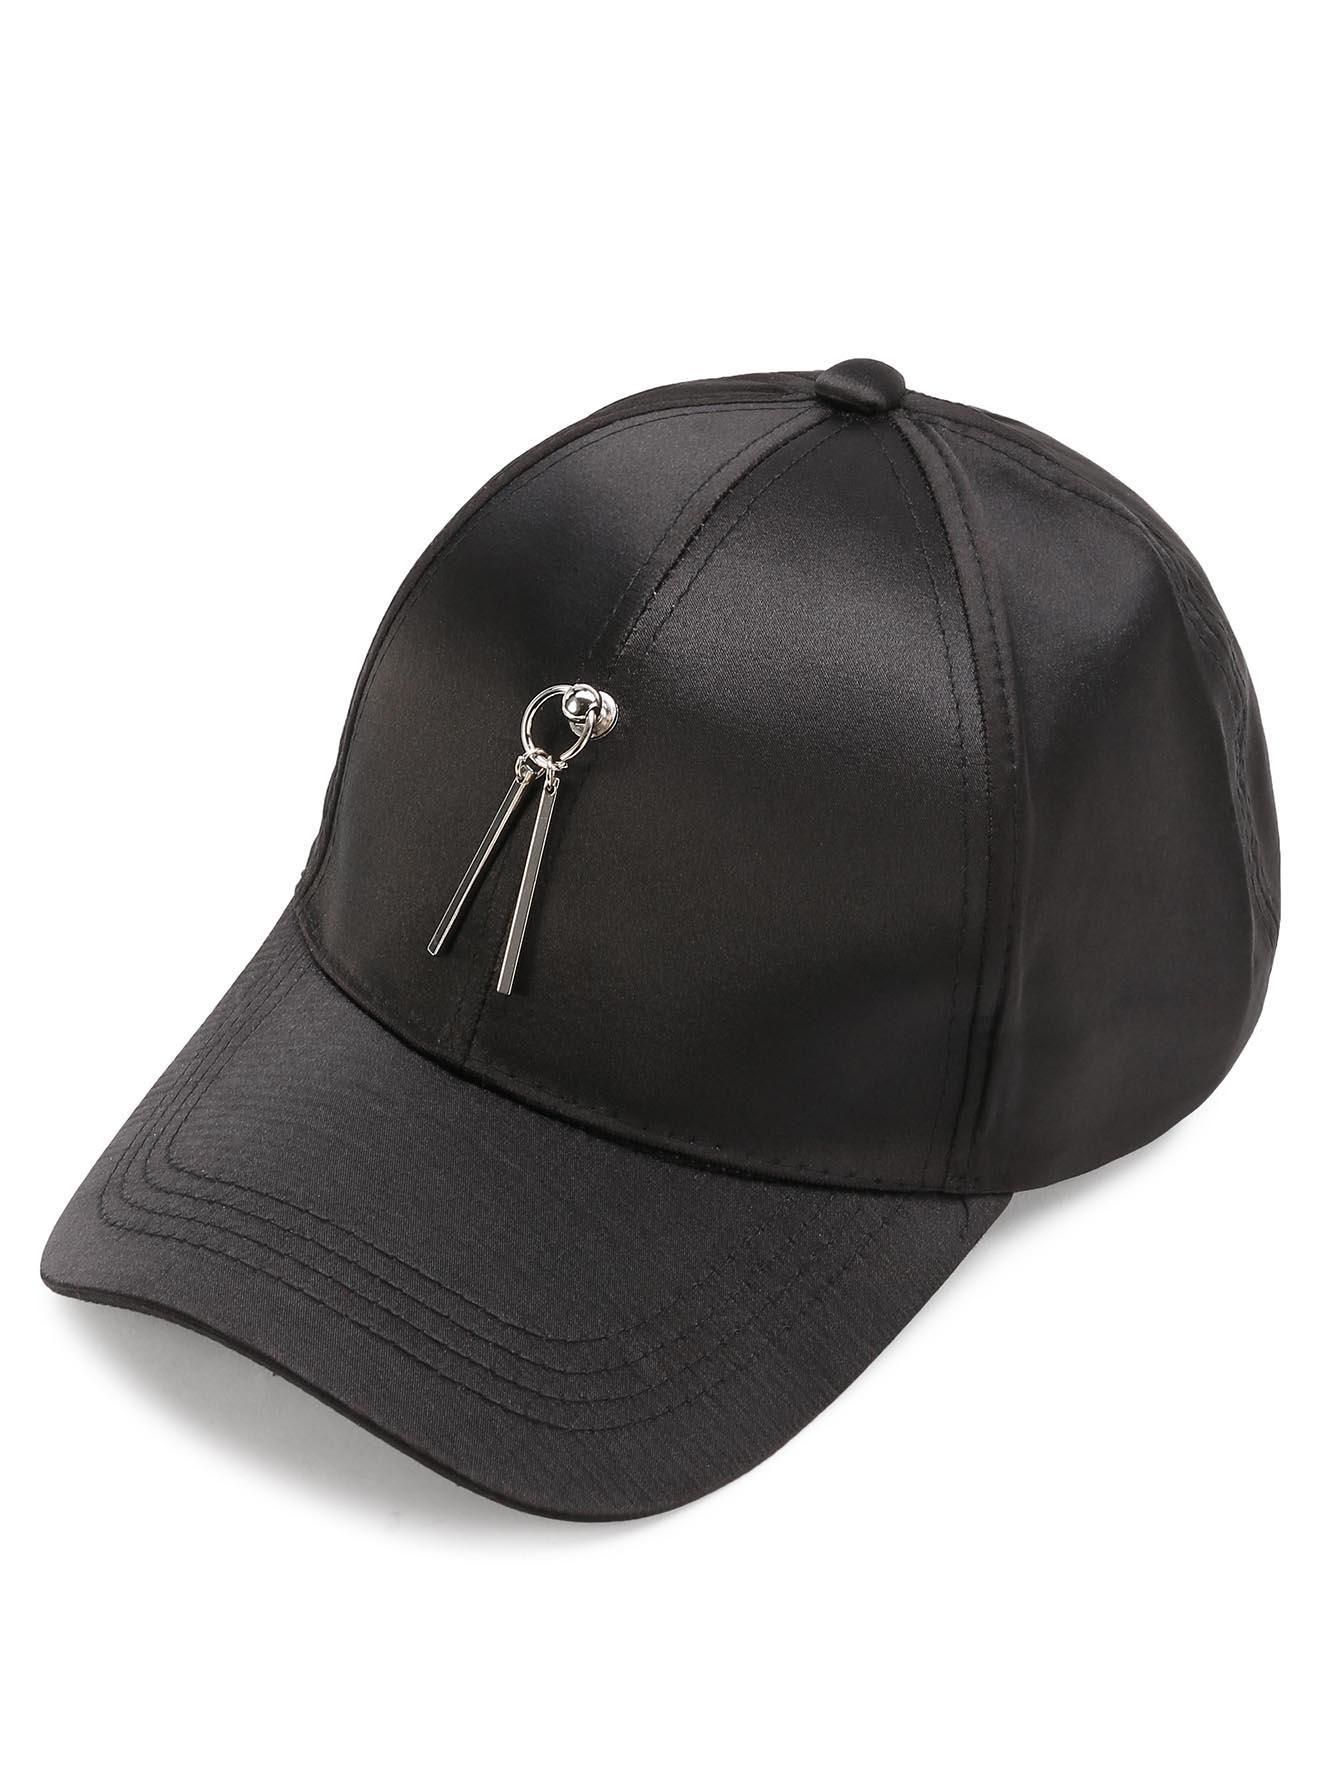 ca84bdc89f Stylish Metal Ring Decorated Embroidery Baseball Hat in 2019 | Stuff to Buy  | Baseball hats, Hats, Baseball